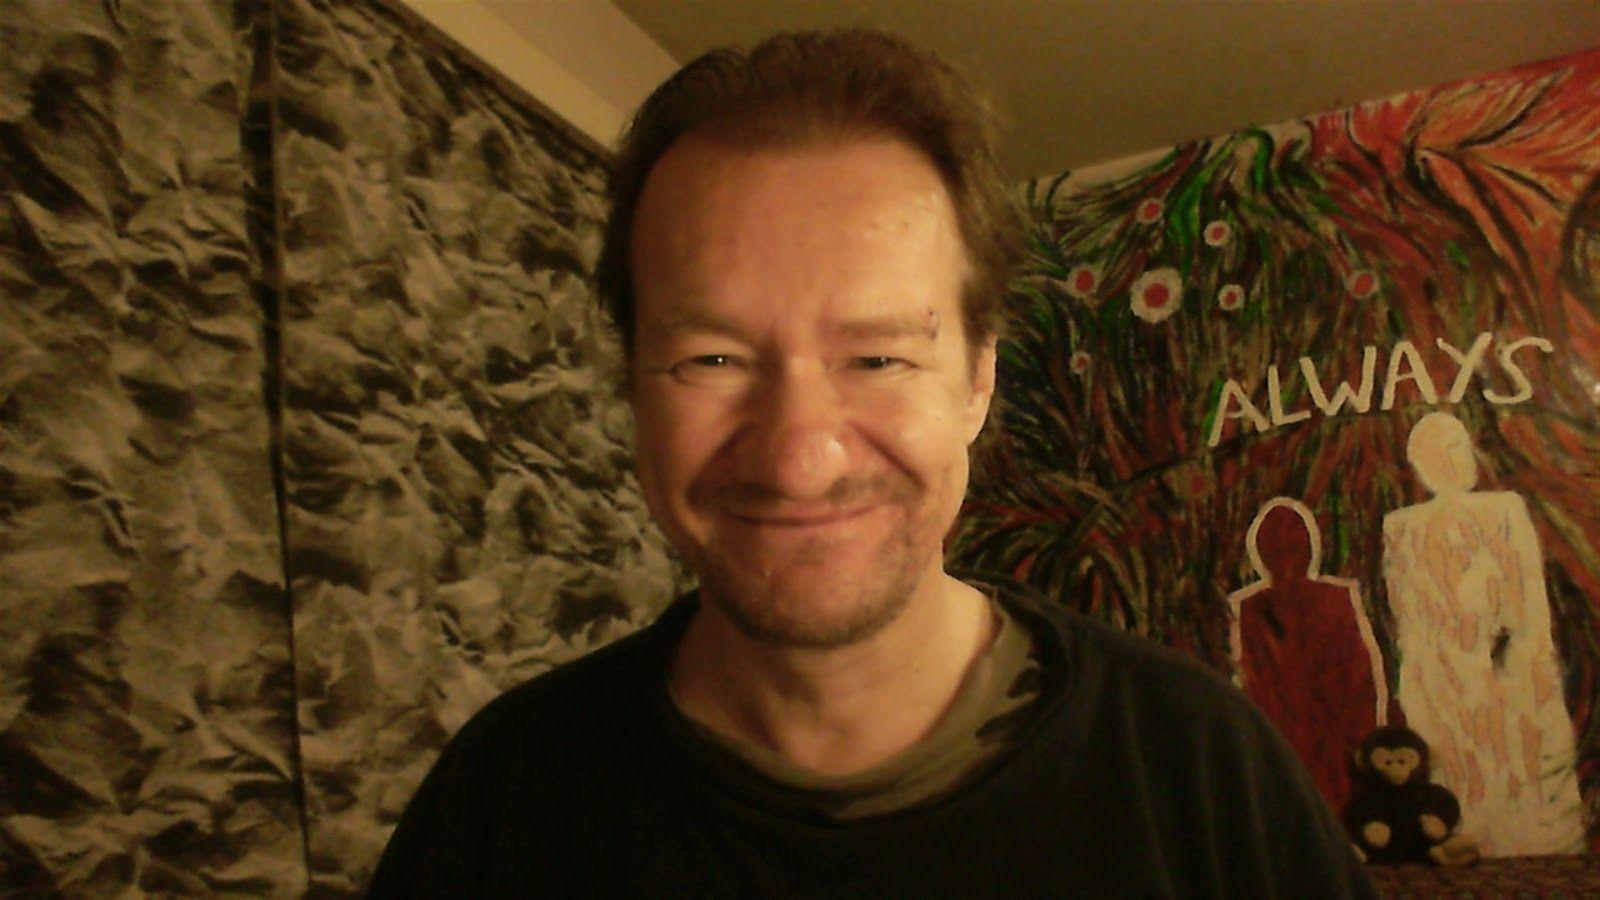 kimmo framelius: aikaisin olen noussut peiton alta